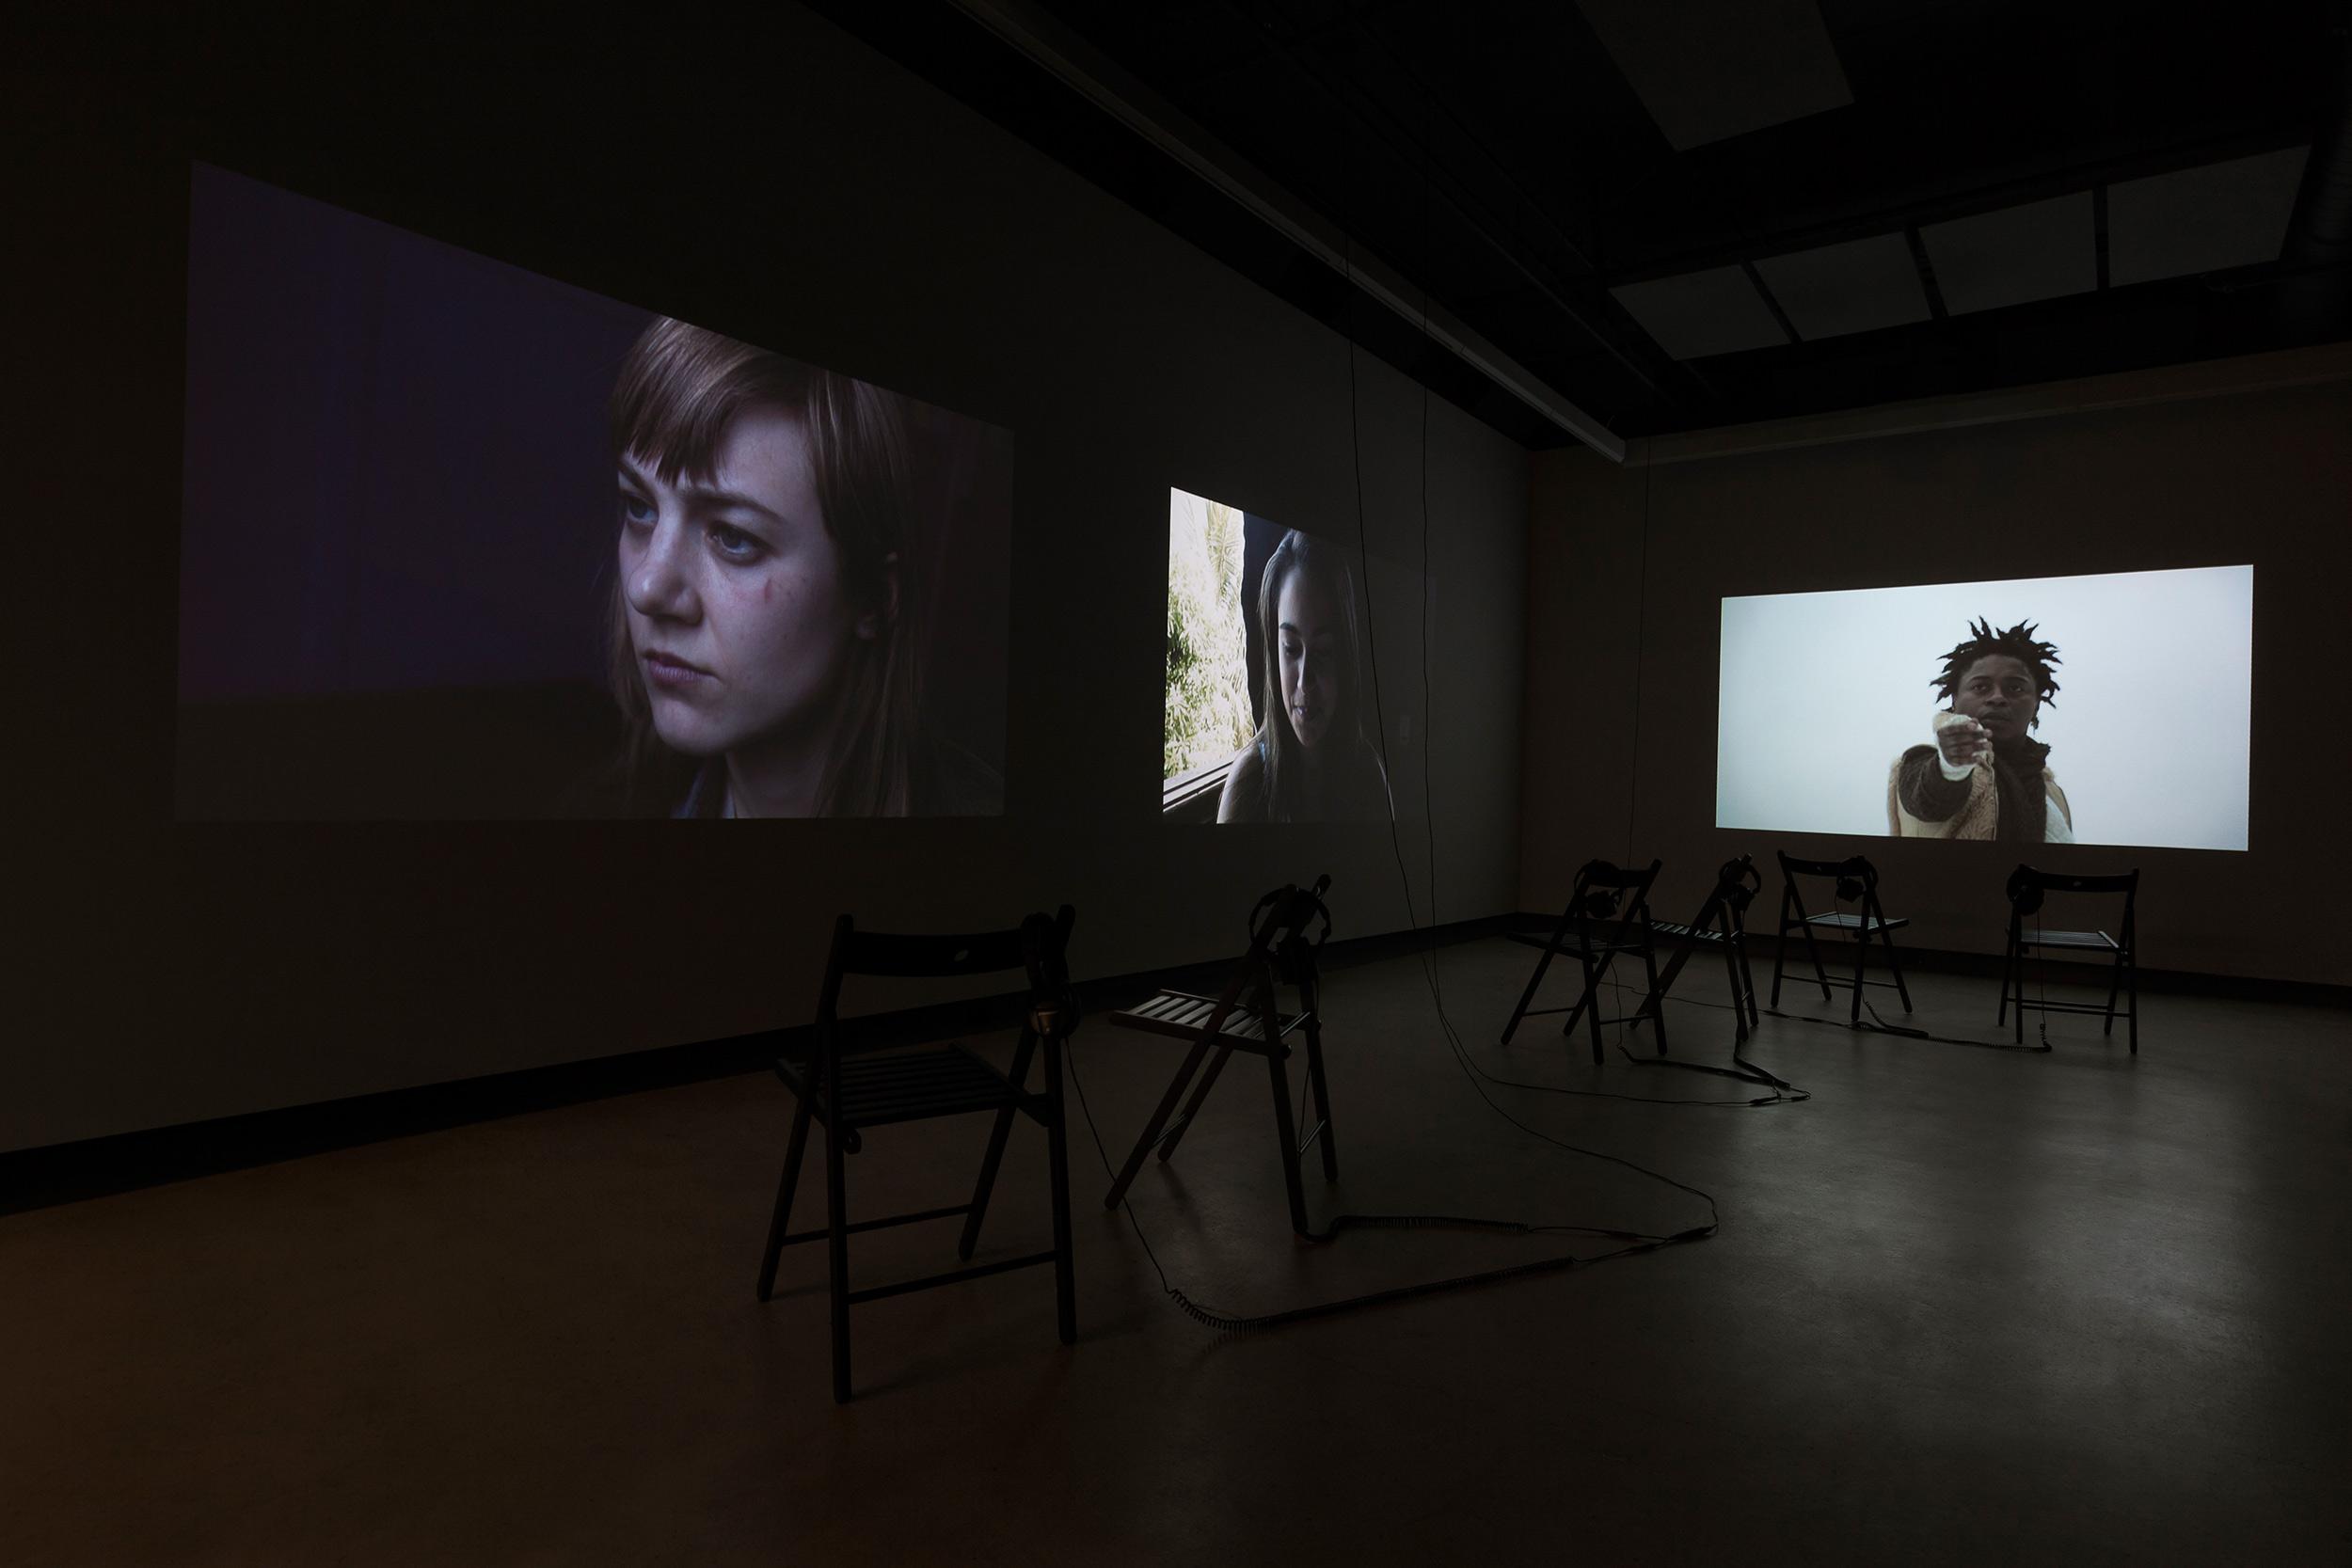 © Nicolas Klotz &Elisabeth Perceval,  Luciles (2013-2017). Exhibition view. Photo: Marilou Crispin.